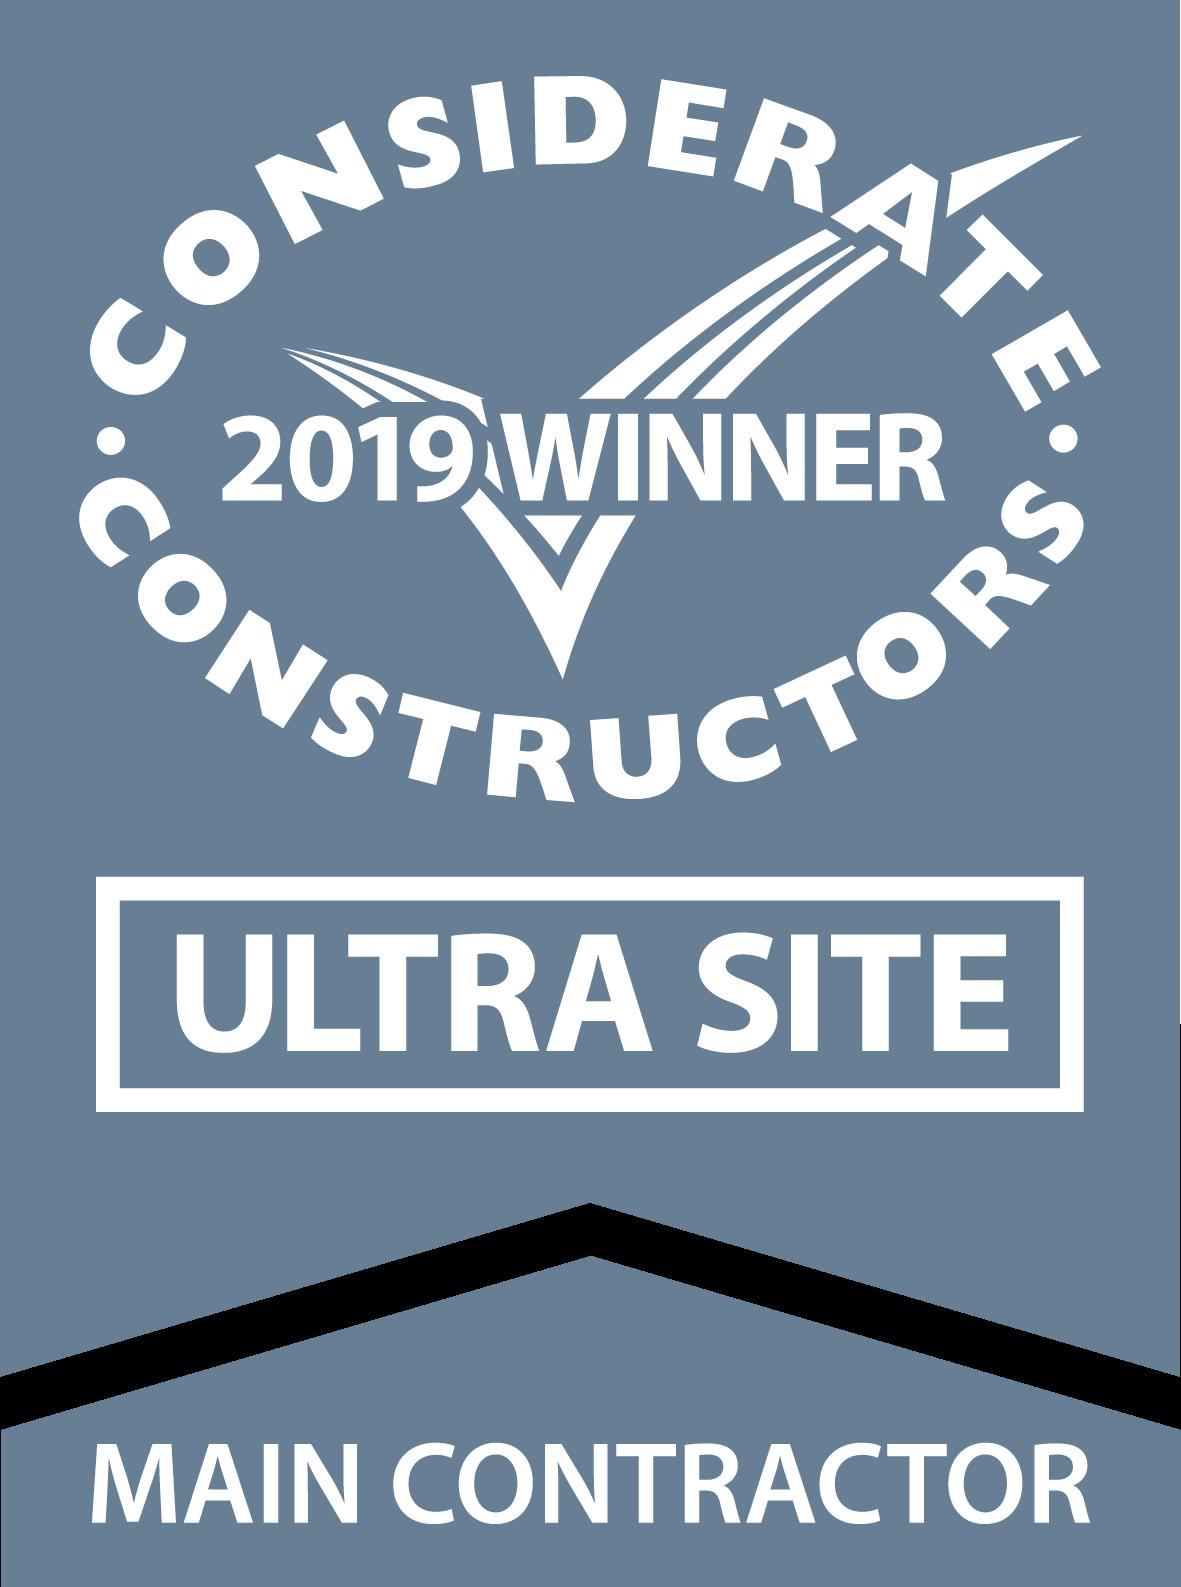 ultra site 2019 logo WINNER CONTRACTOR.png